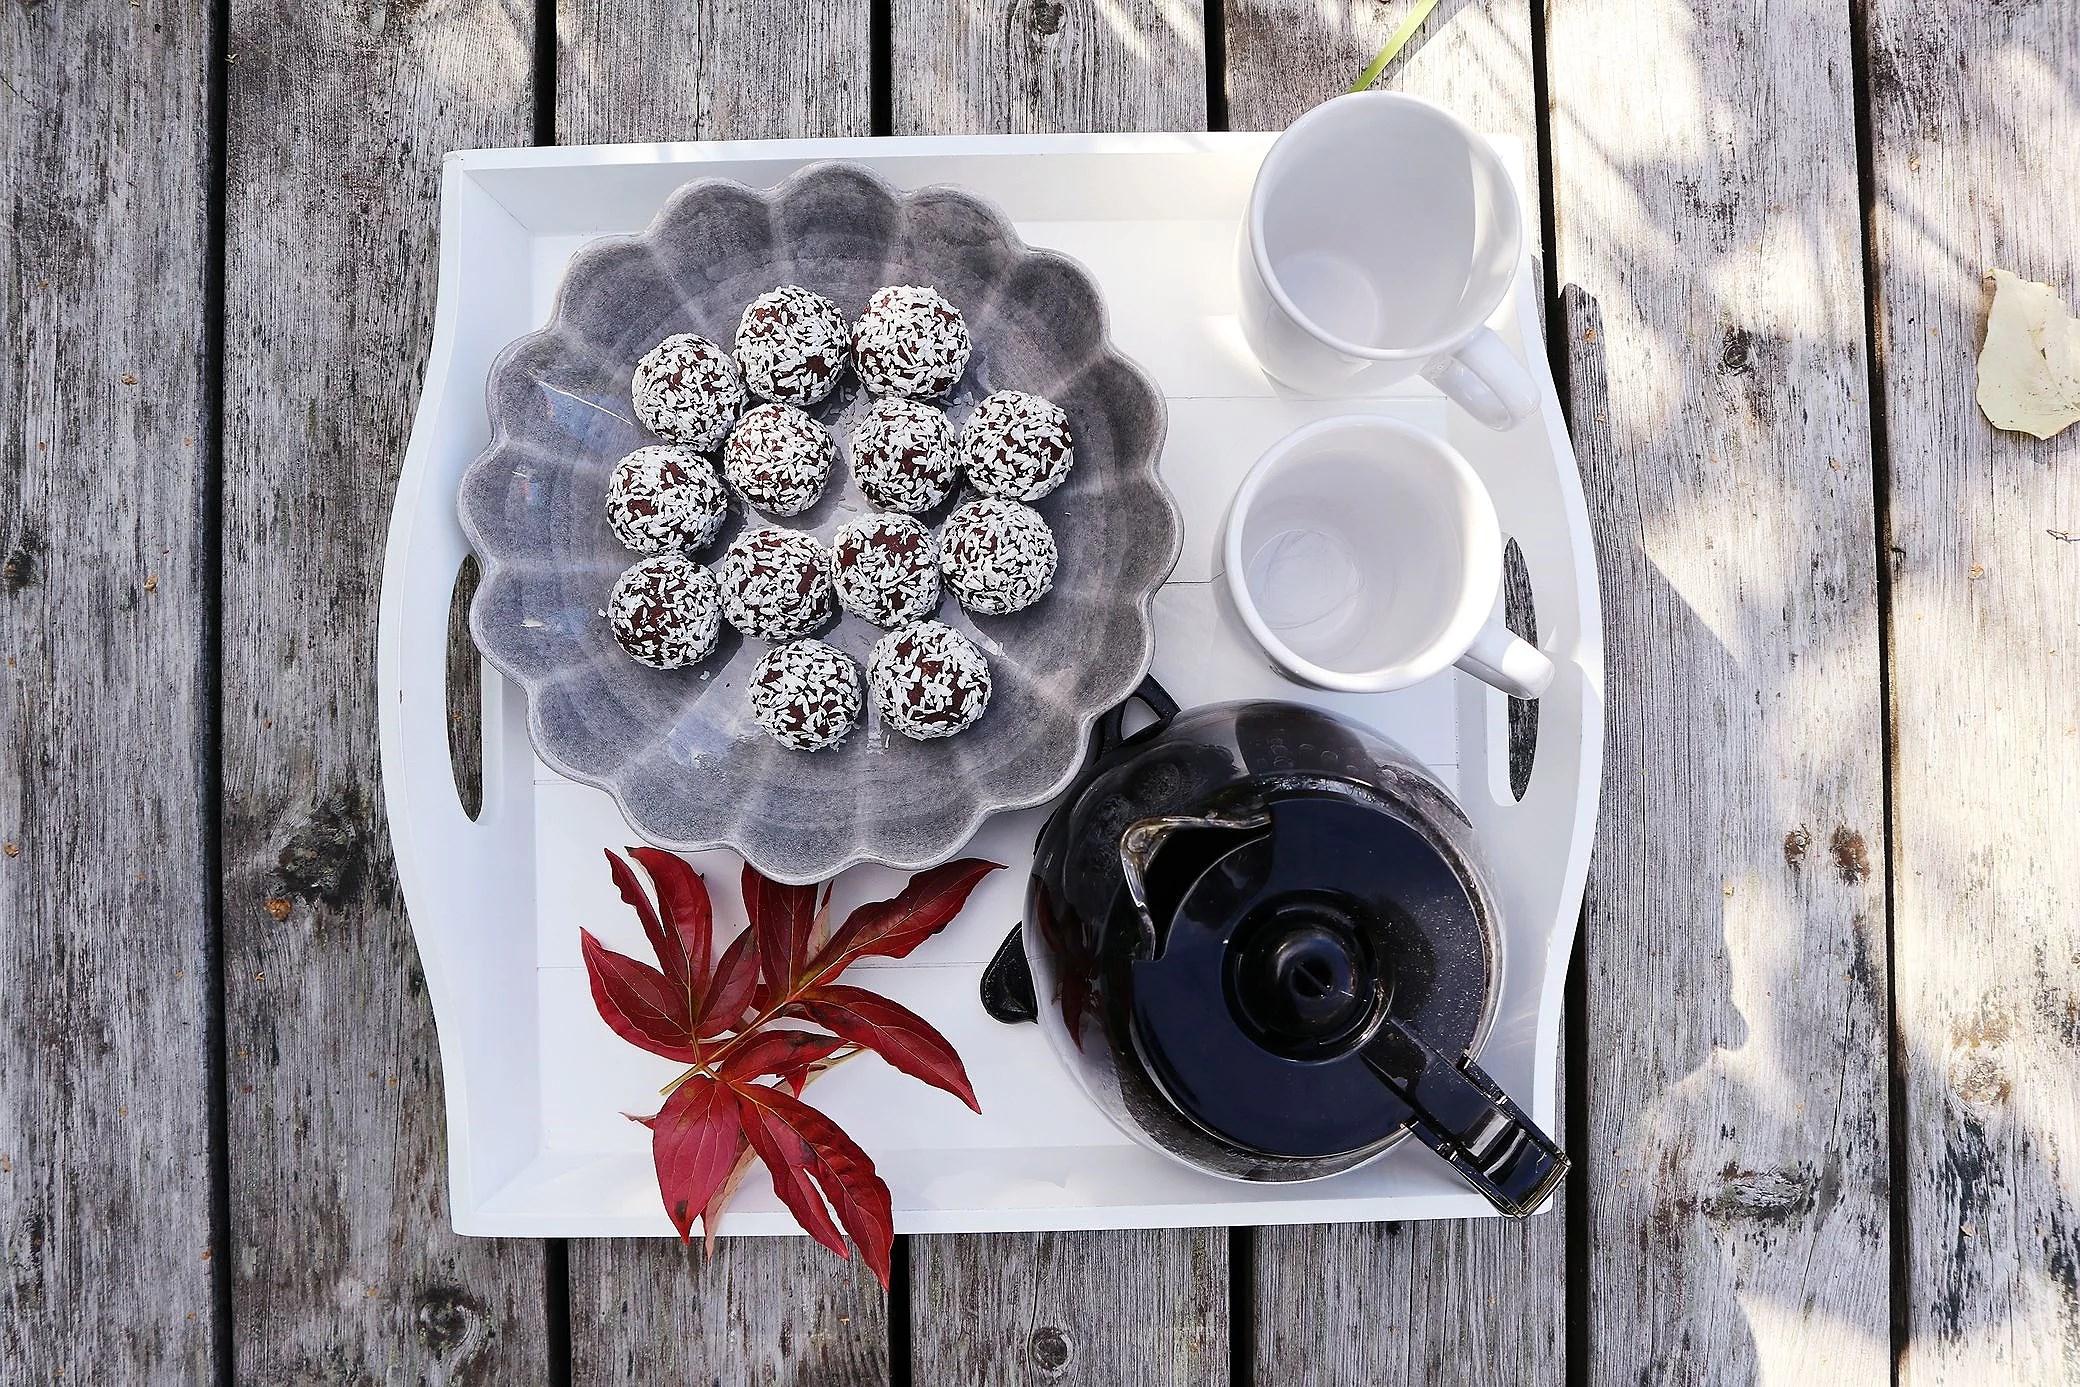 Lite nyttigare chokladbollar